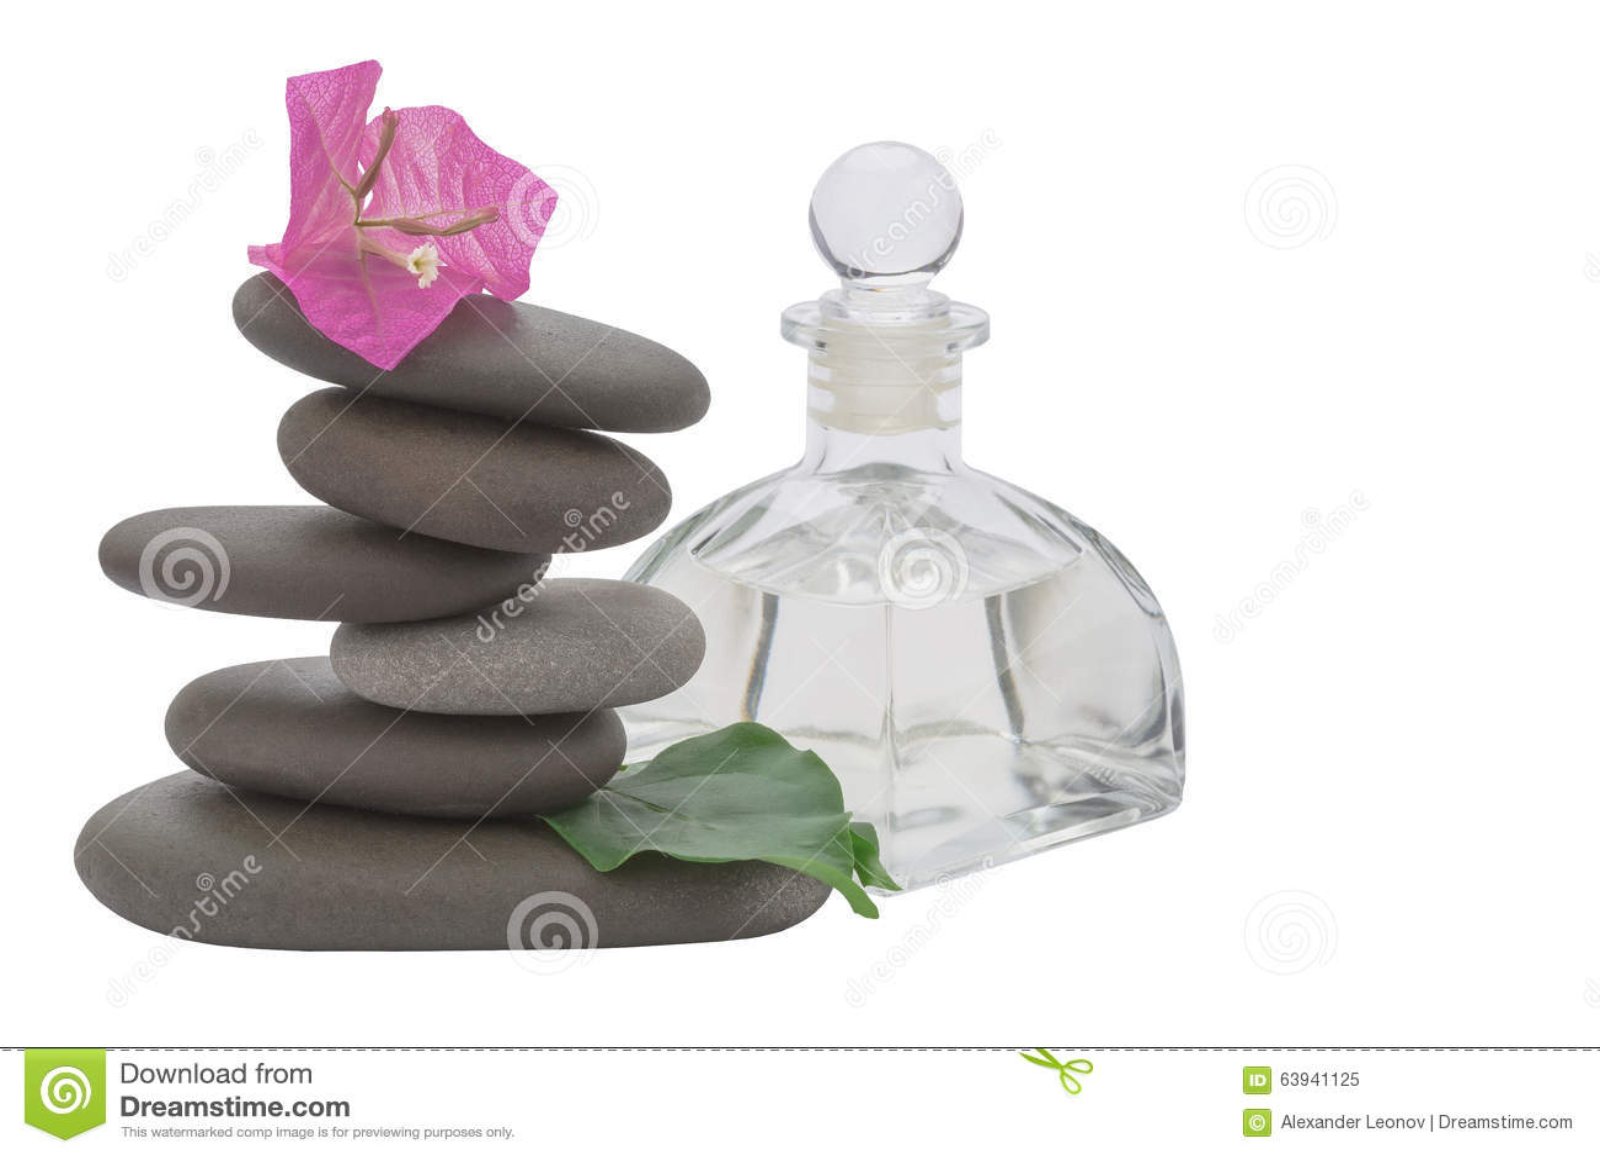 Spa Stone Stock Image